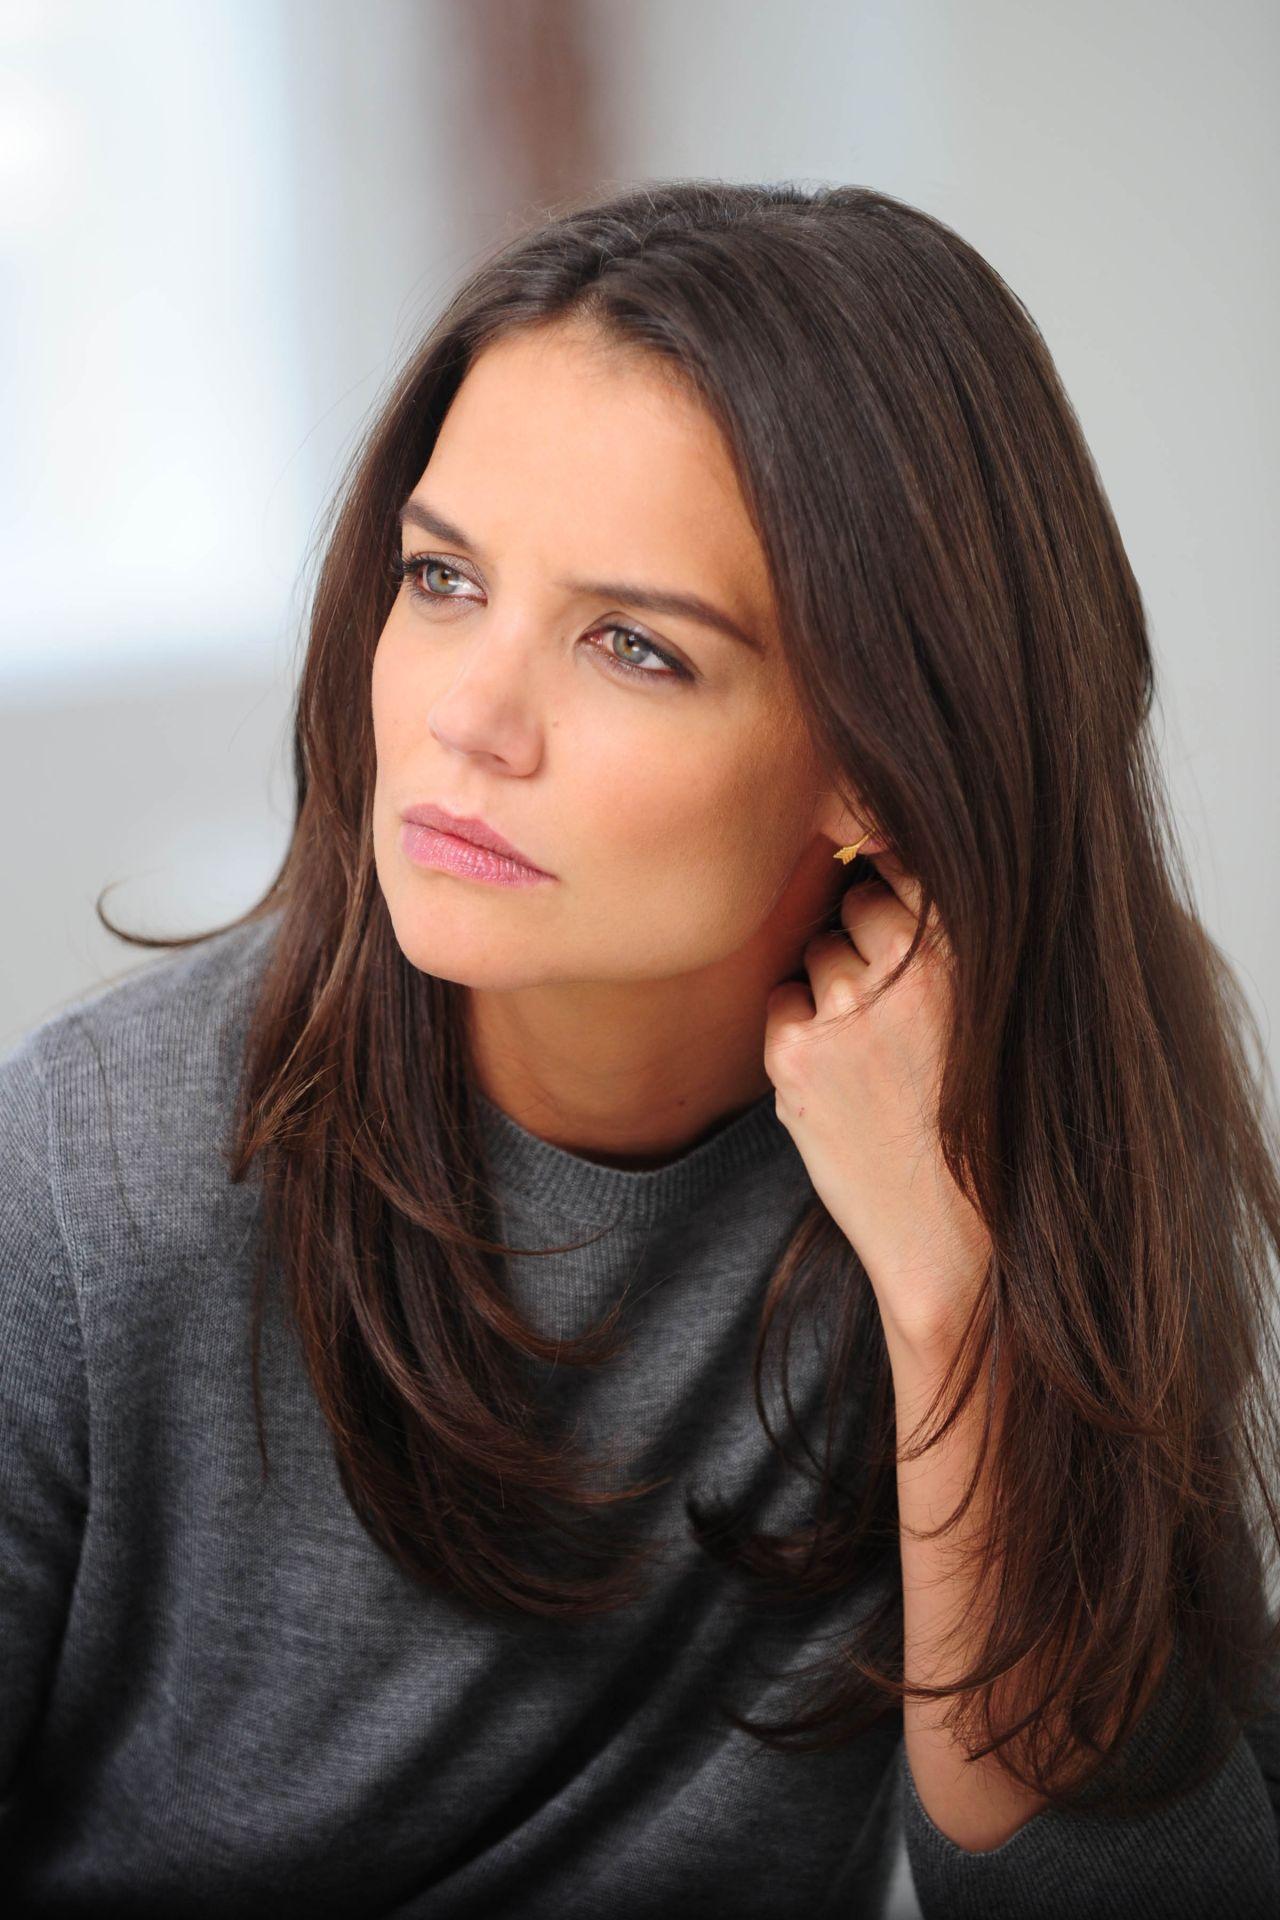 Katie Holmes - 2015 Celebrity Photos